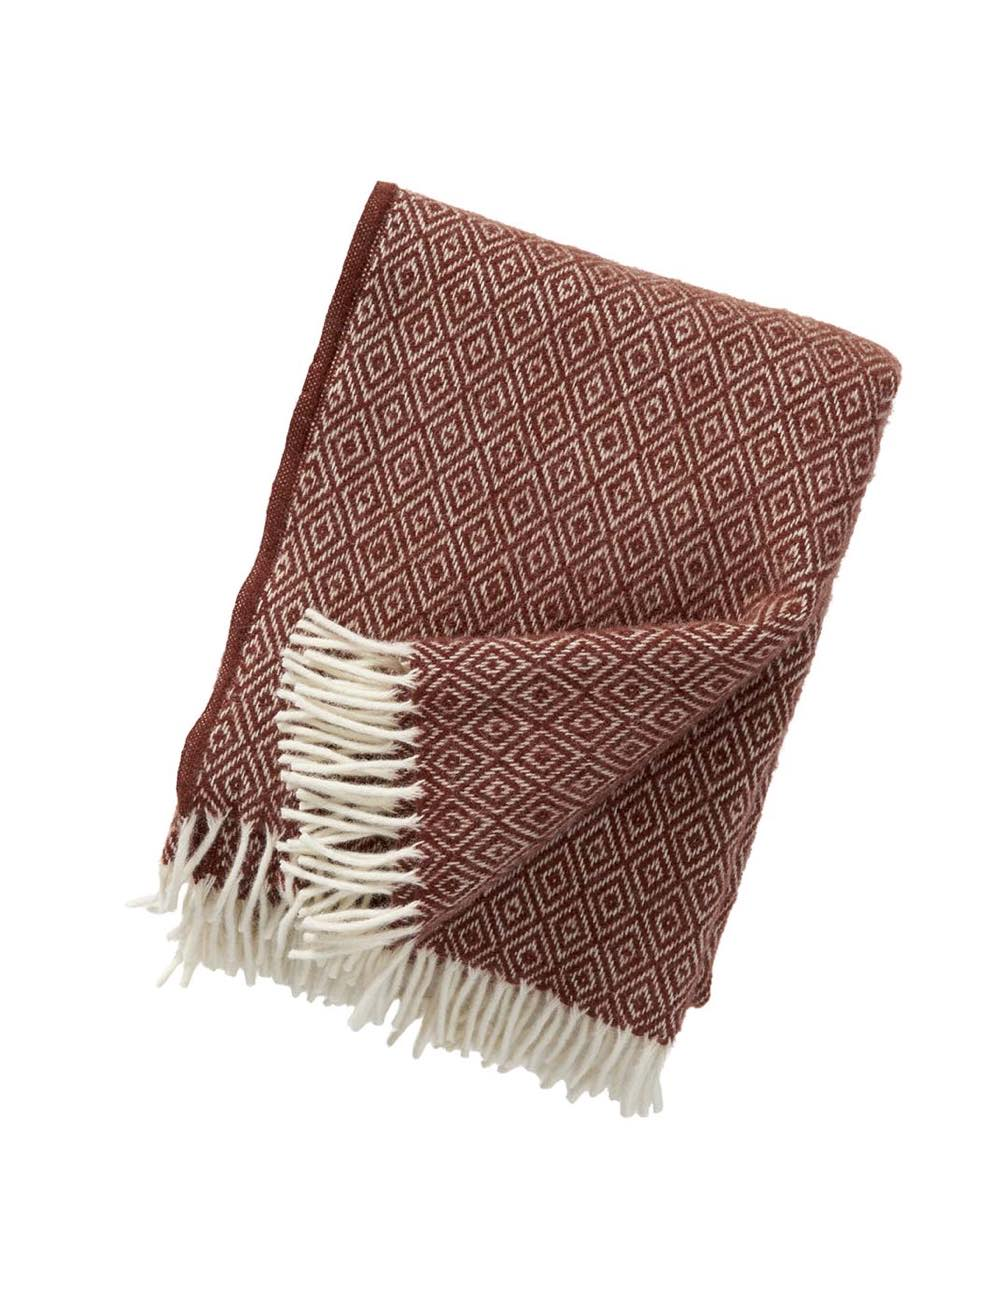 Stella Rust Blanket/Throw